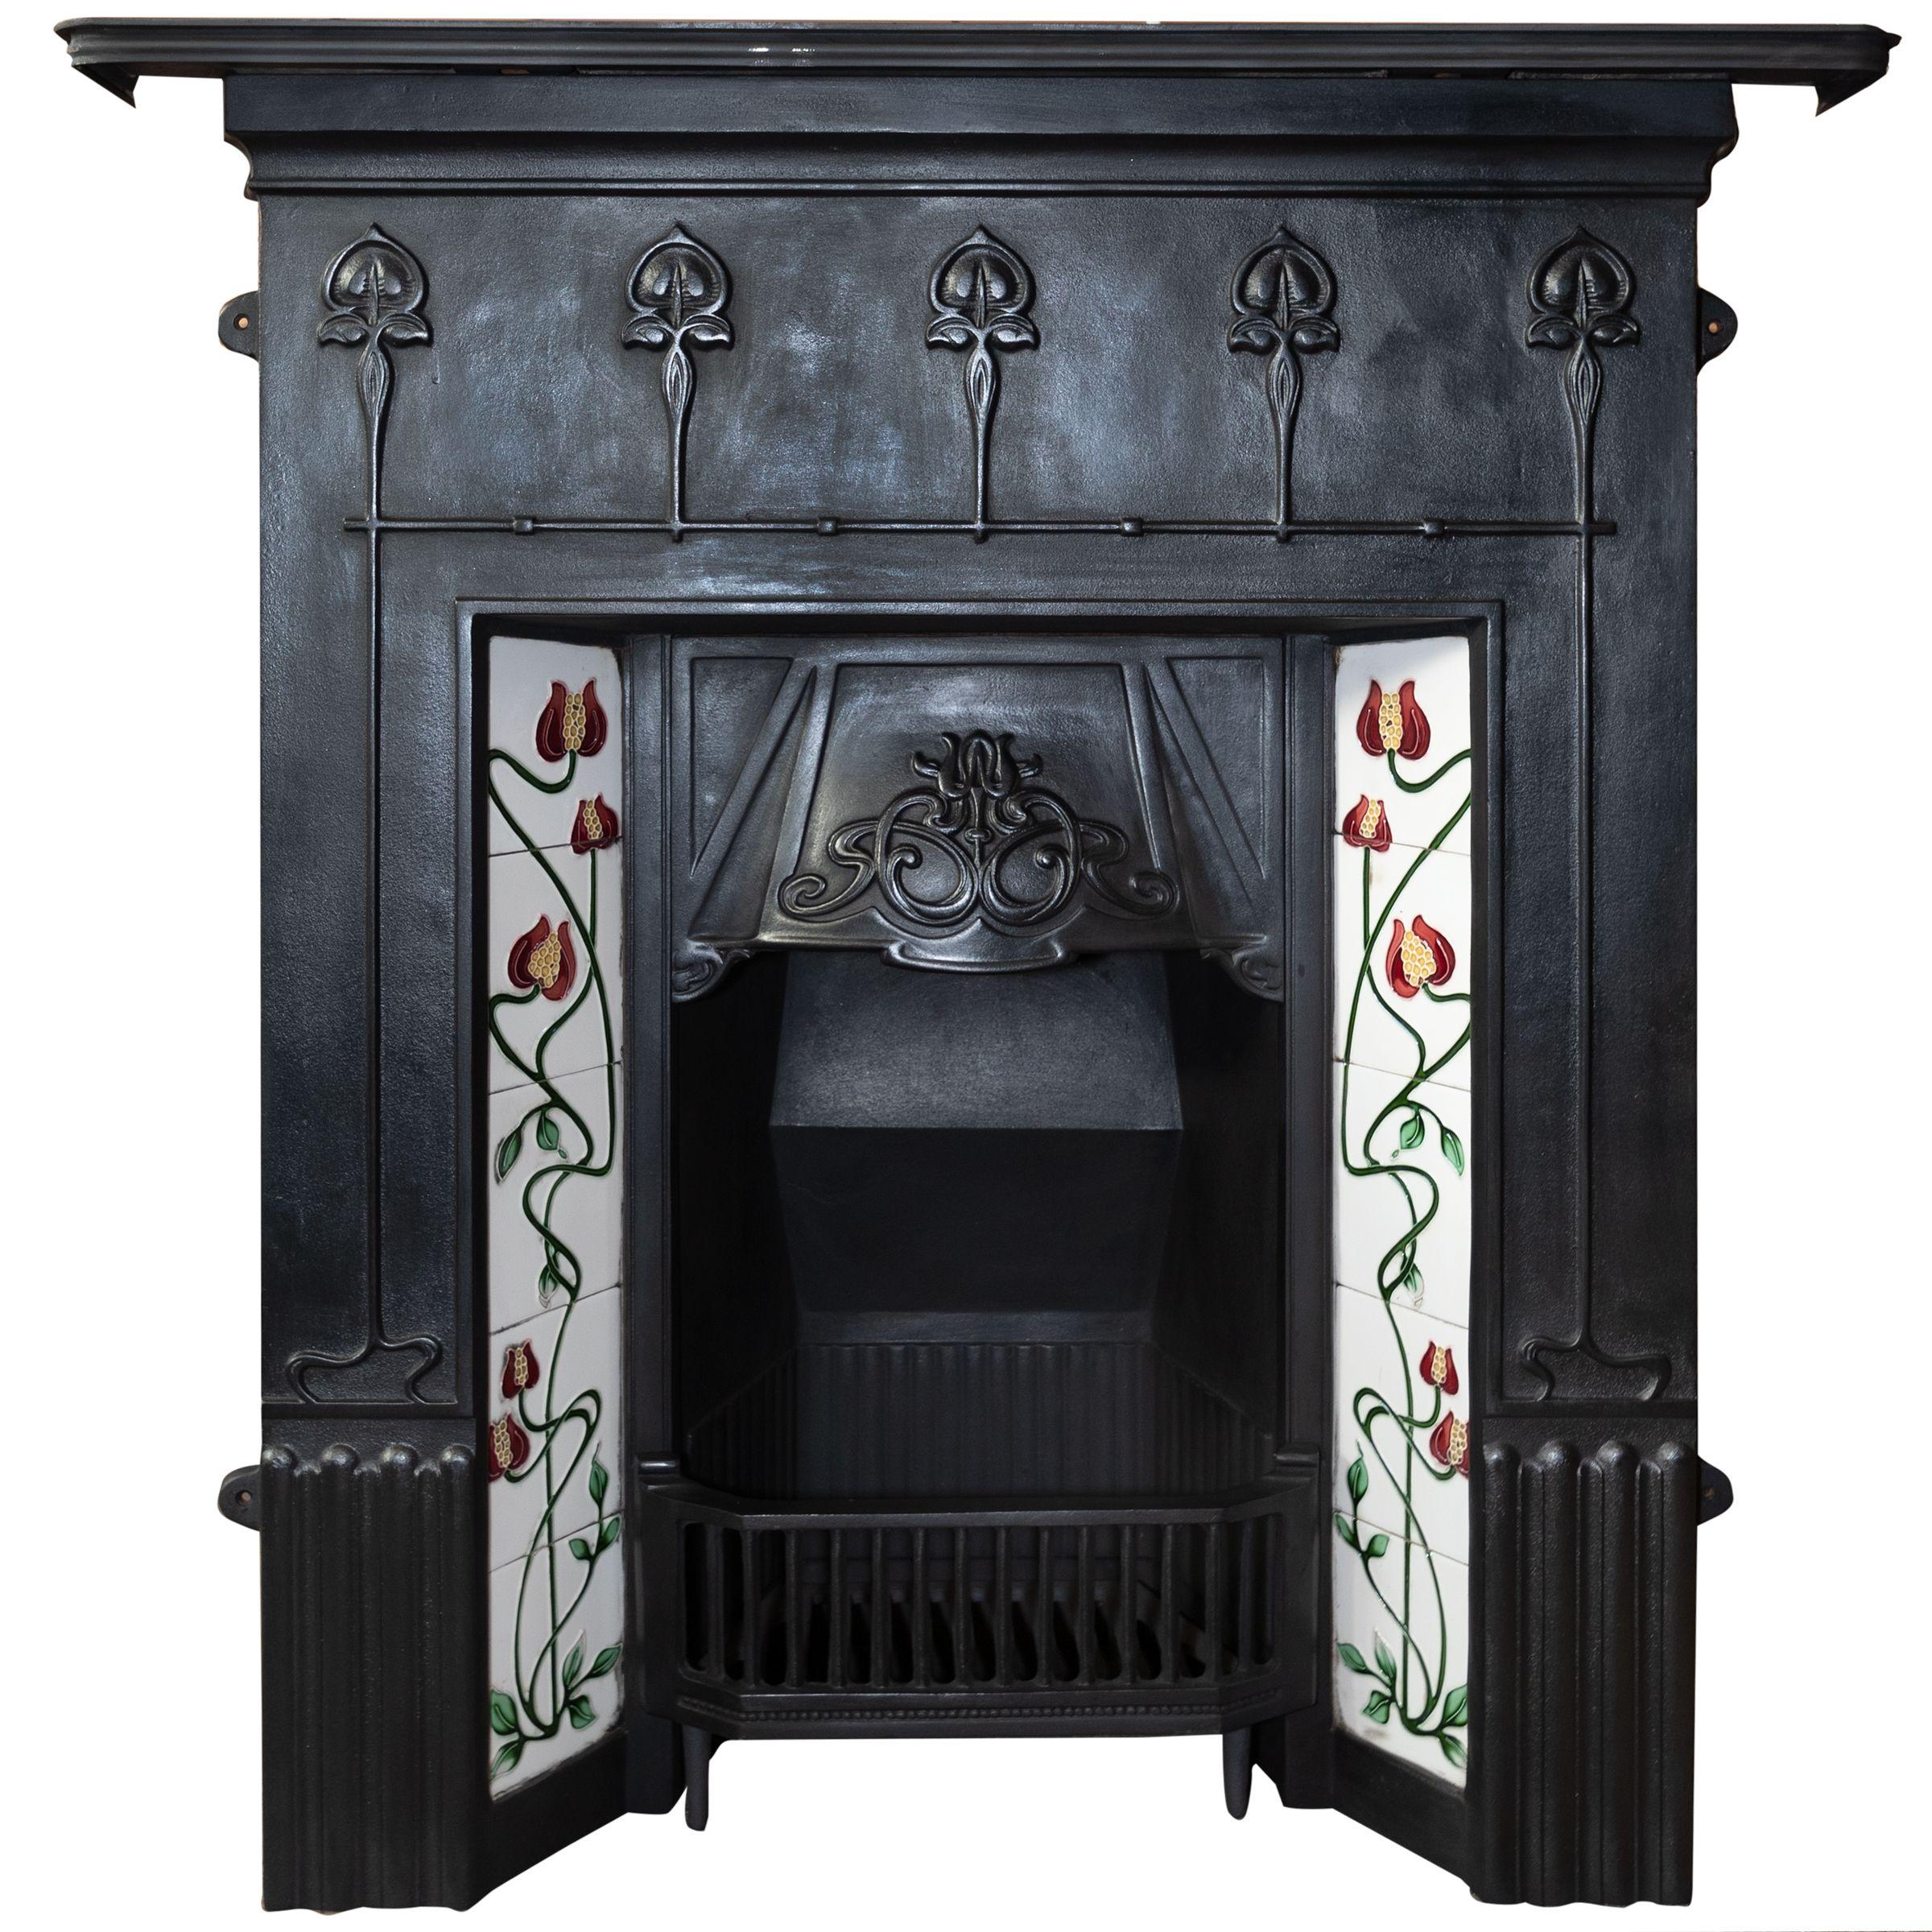 Coal Burning Fireplace Elegant Huge Selection Of Antique Cast Iron Fireplaces Fully